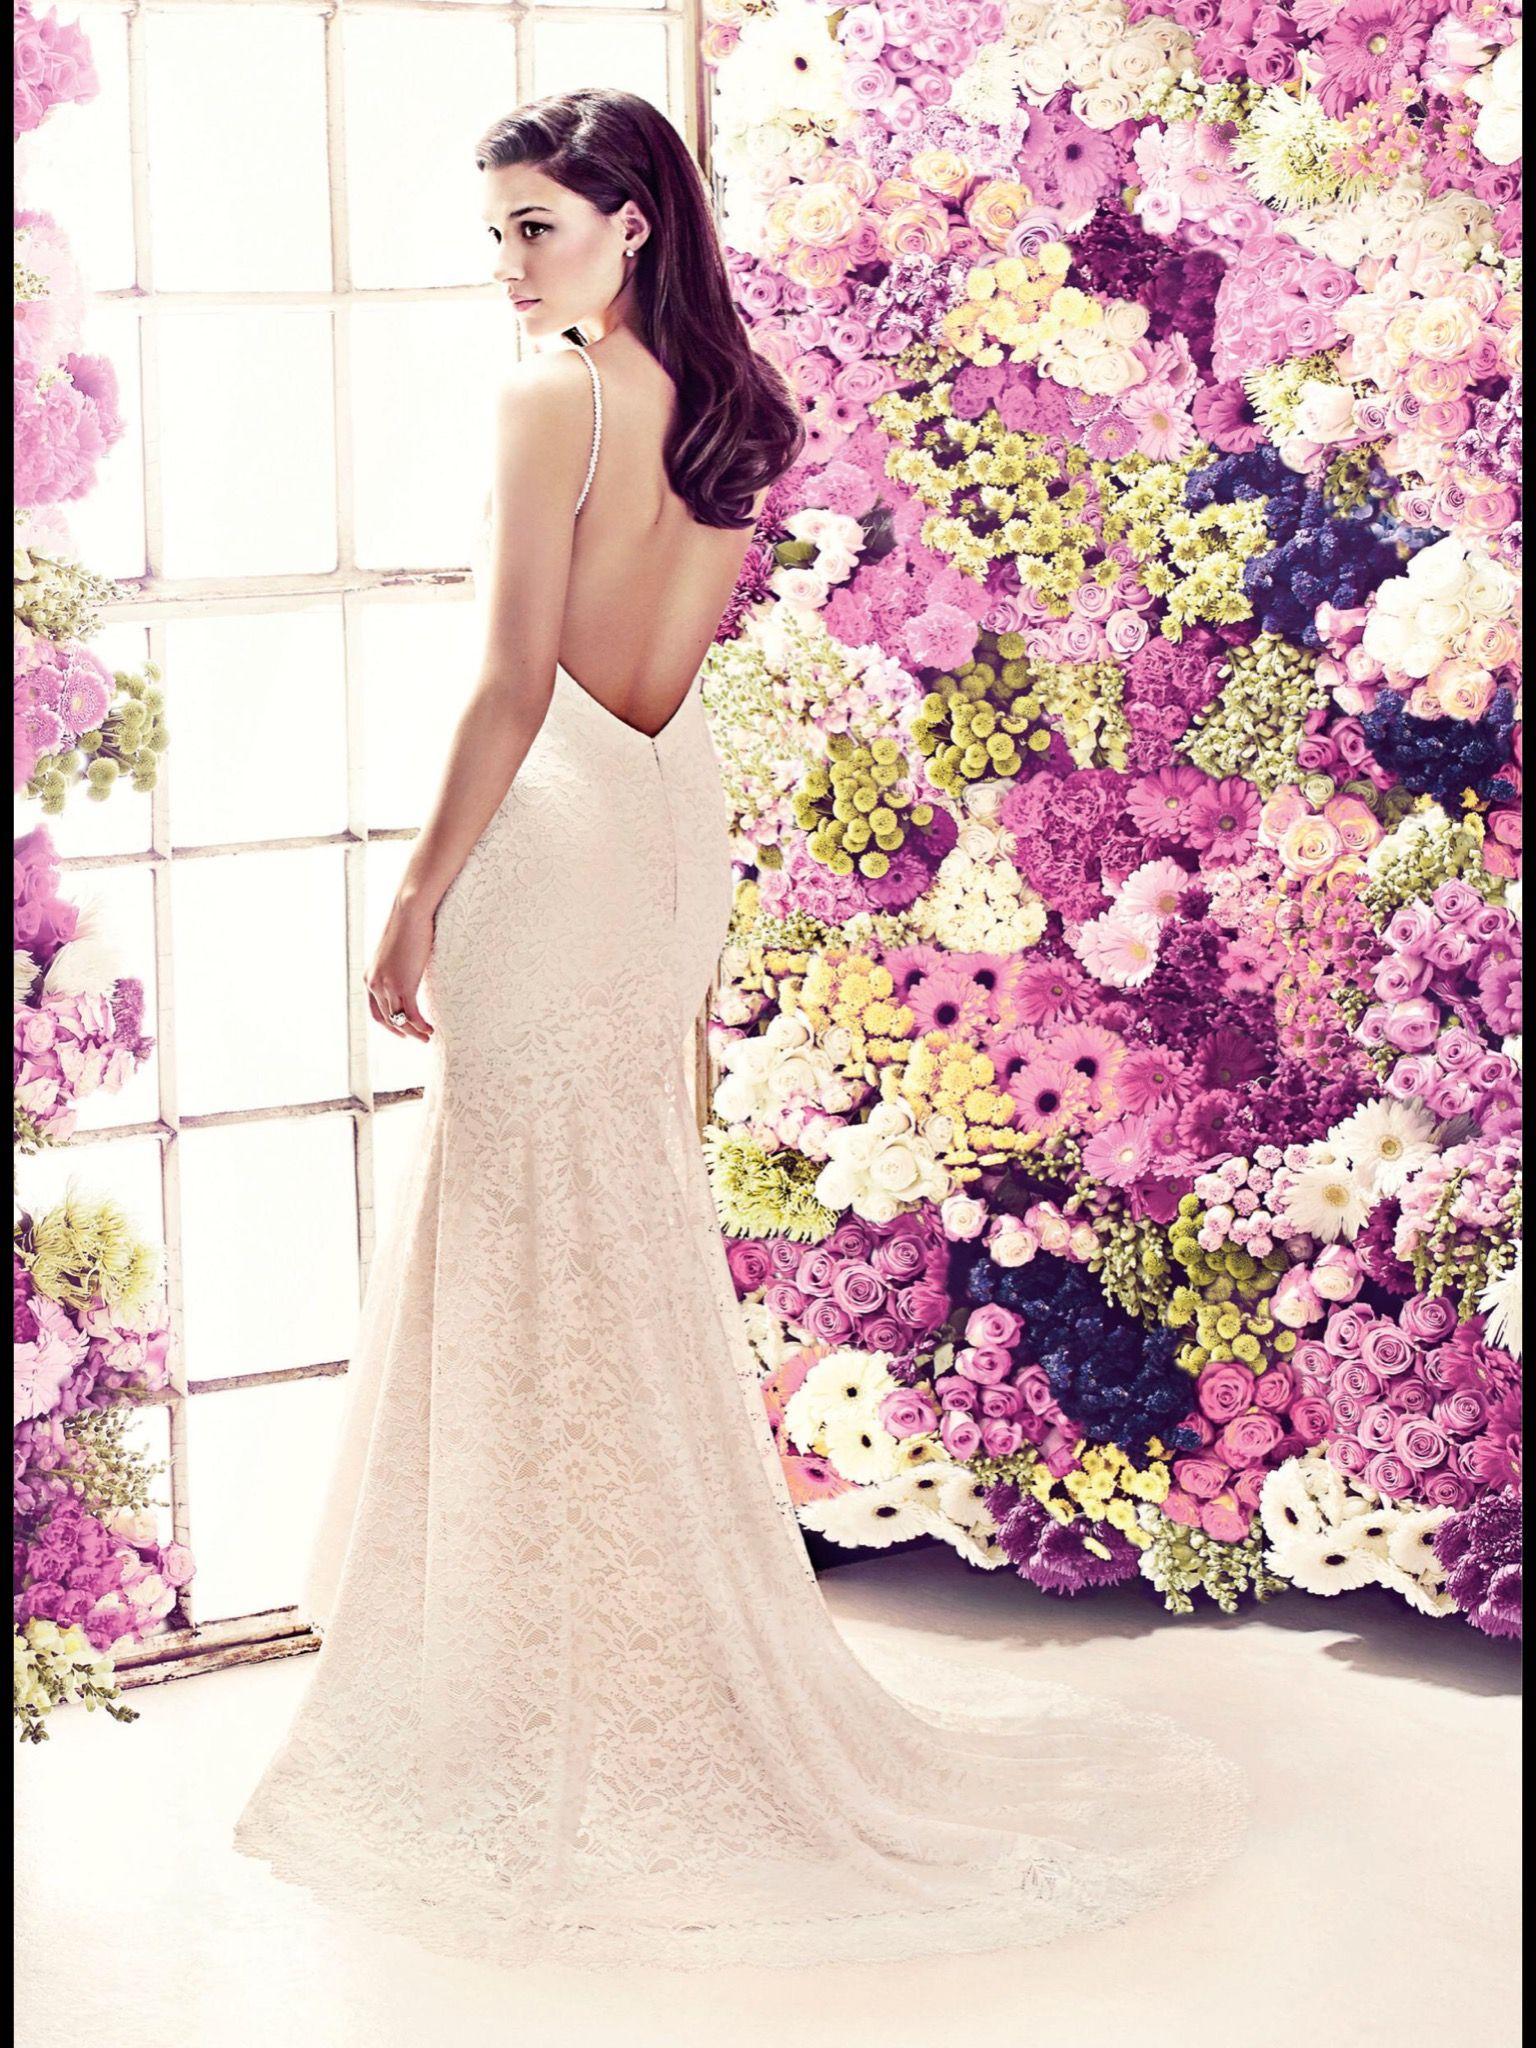 Mikaella | Weddings a Signature of Love | Pinterest | Wedding dress ...